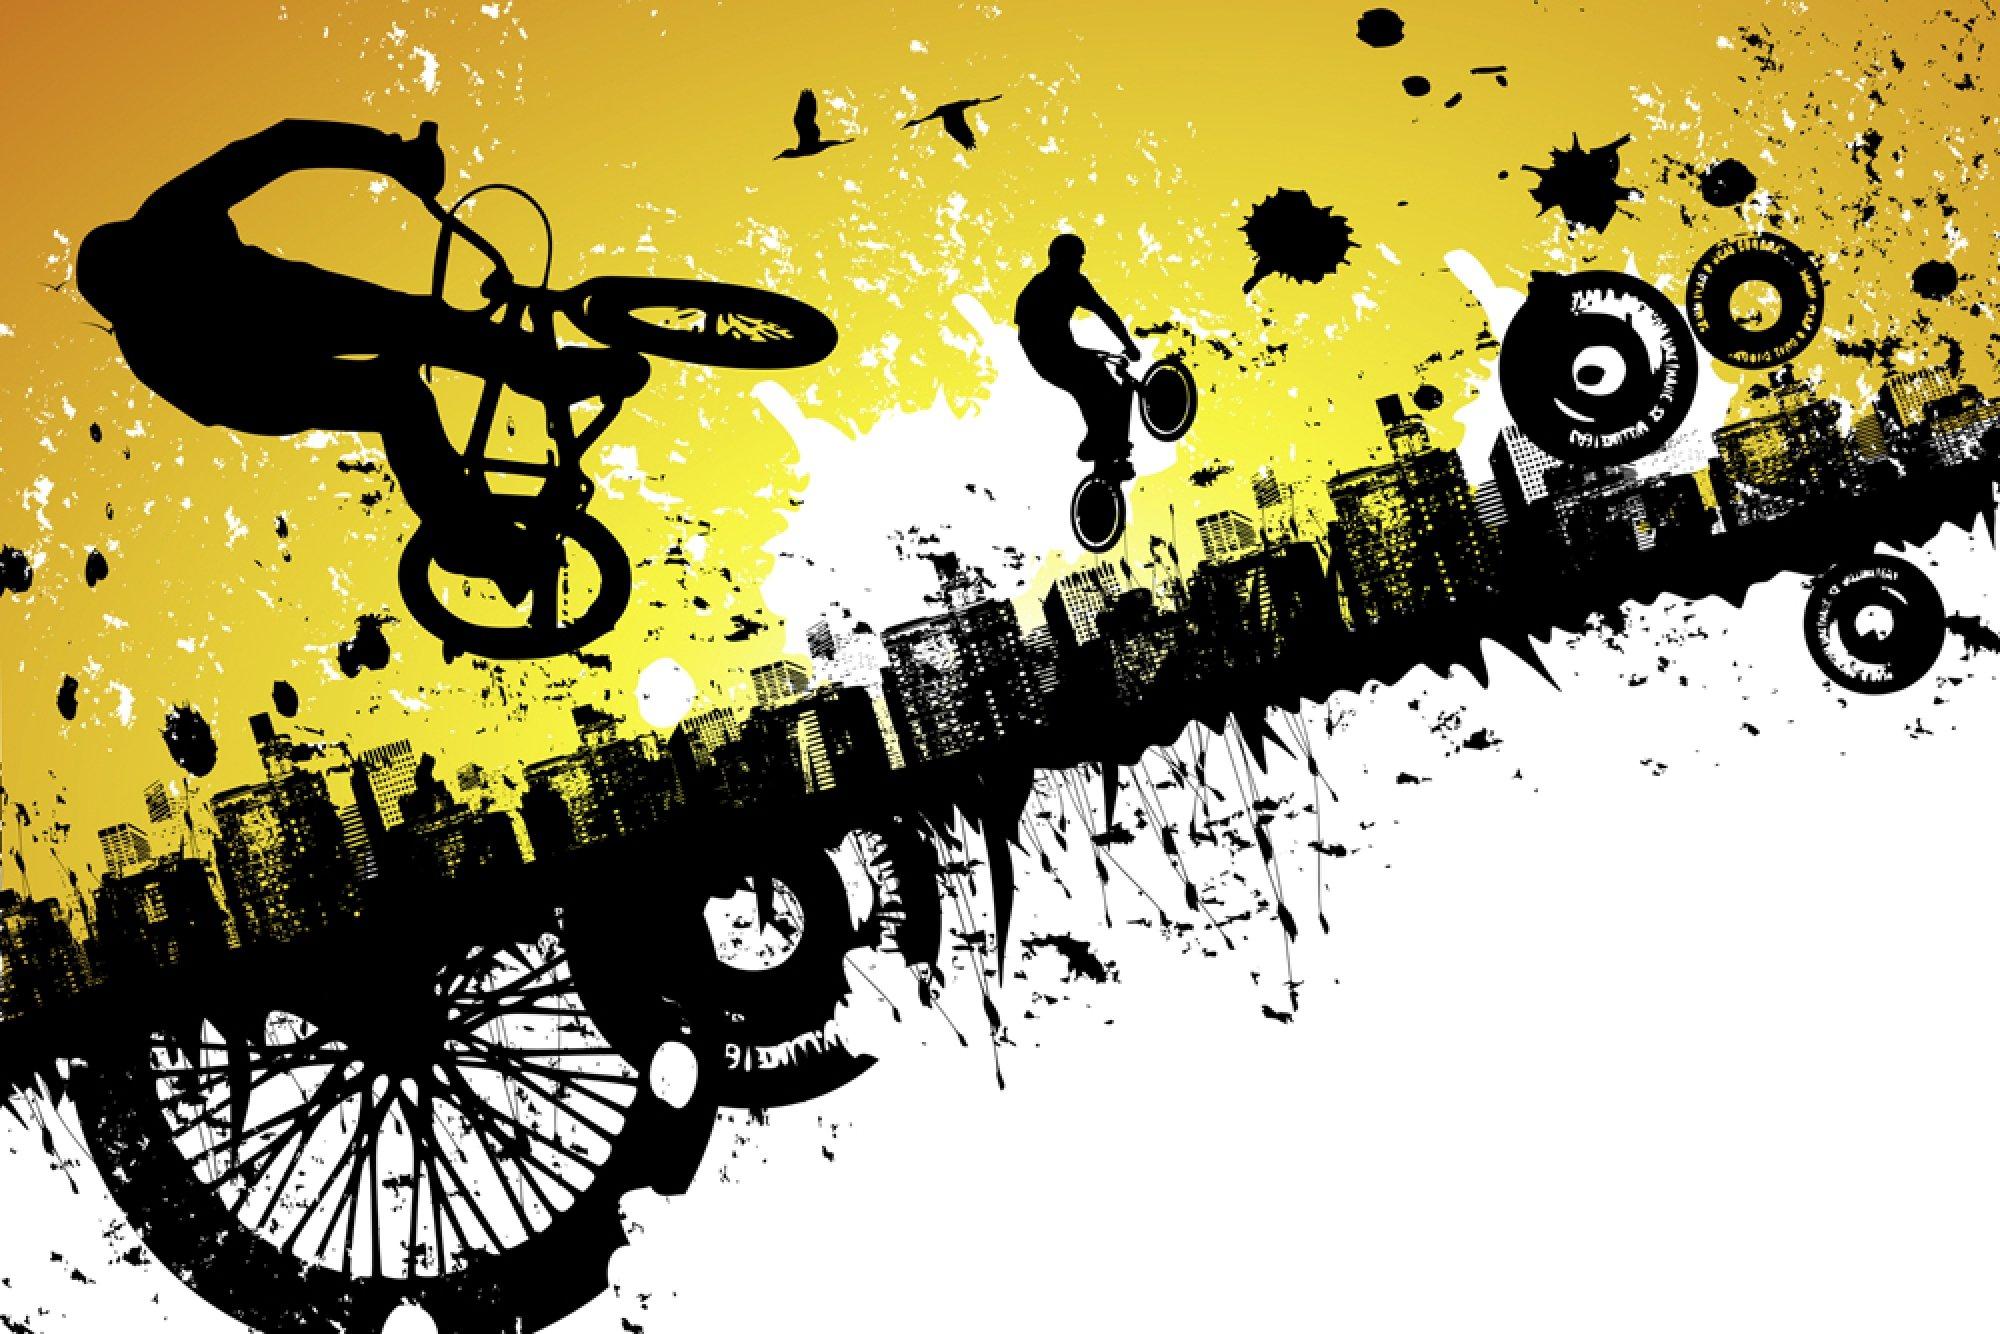 Red And Black Graffiti Wallpaper Bmx Logo Bike Bicycle Wallpaper 2000x1334 463397